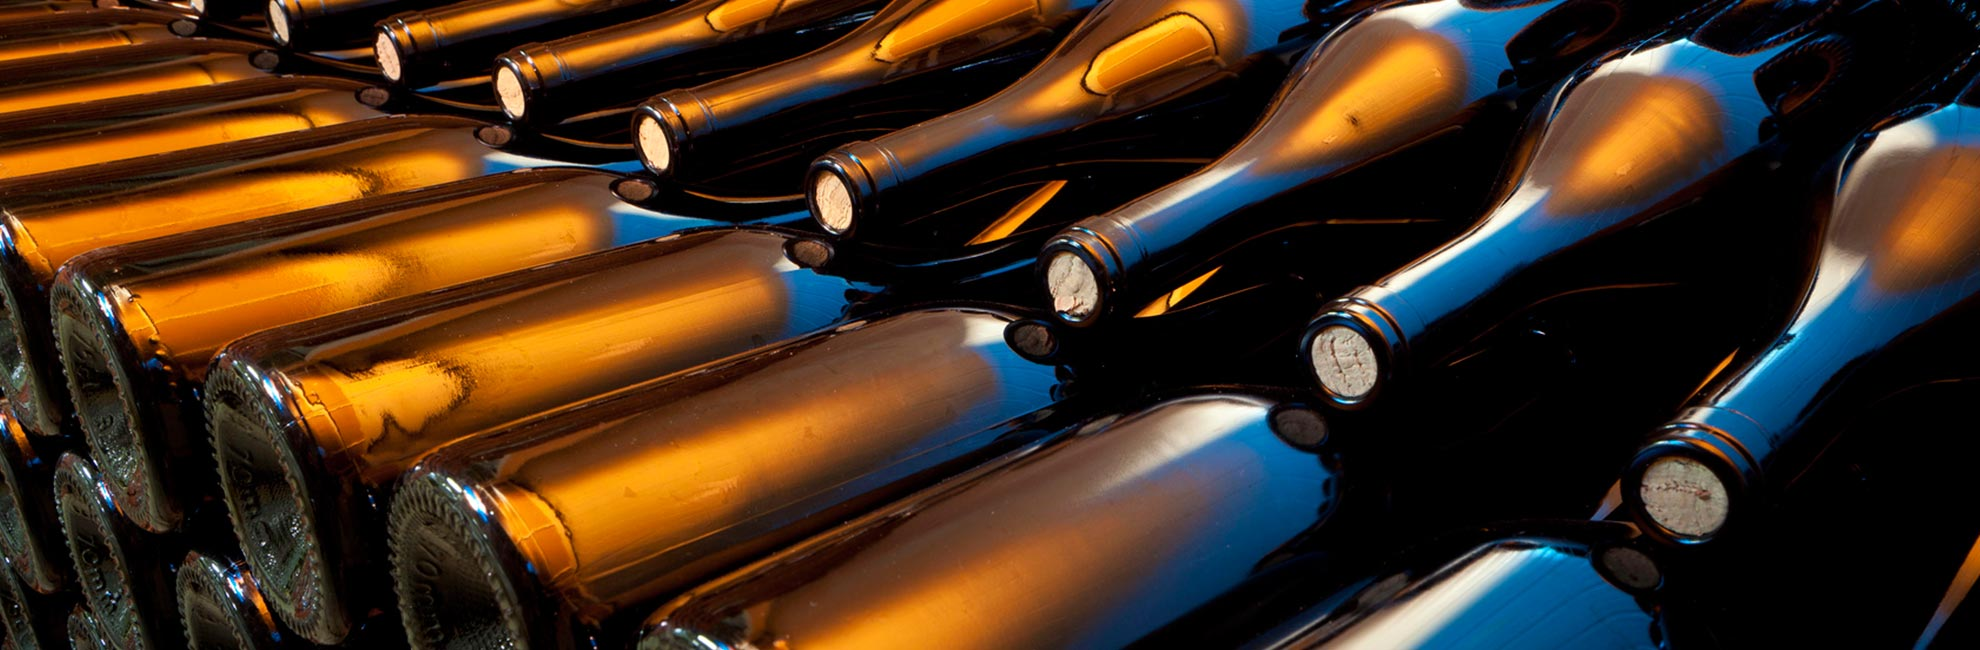 botellas-vino-don-quijote